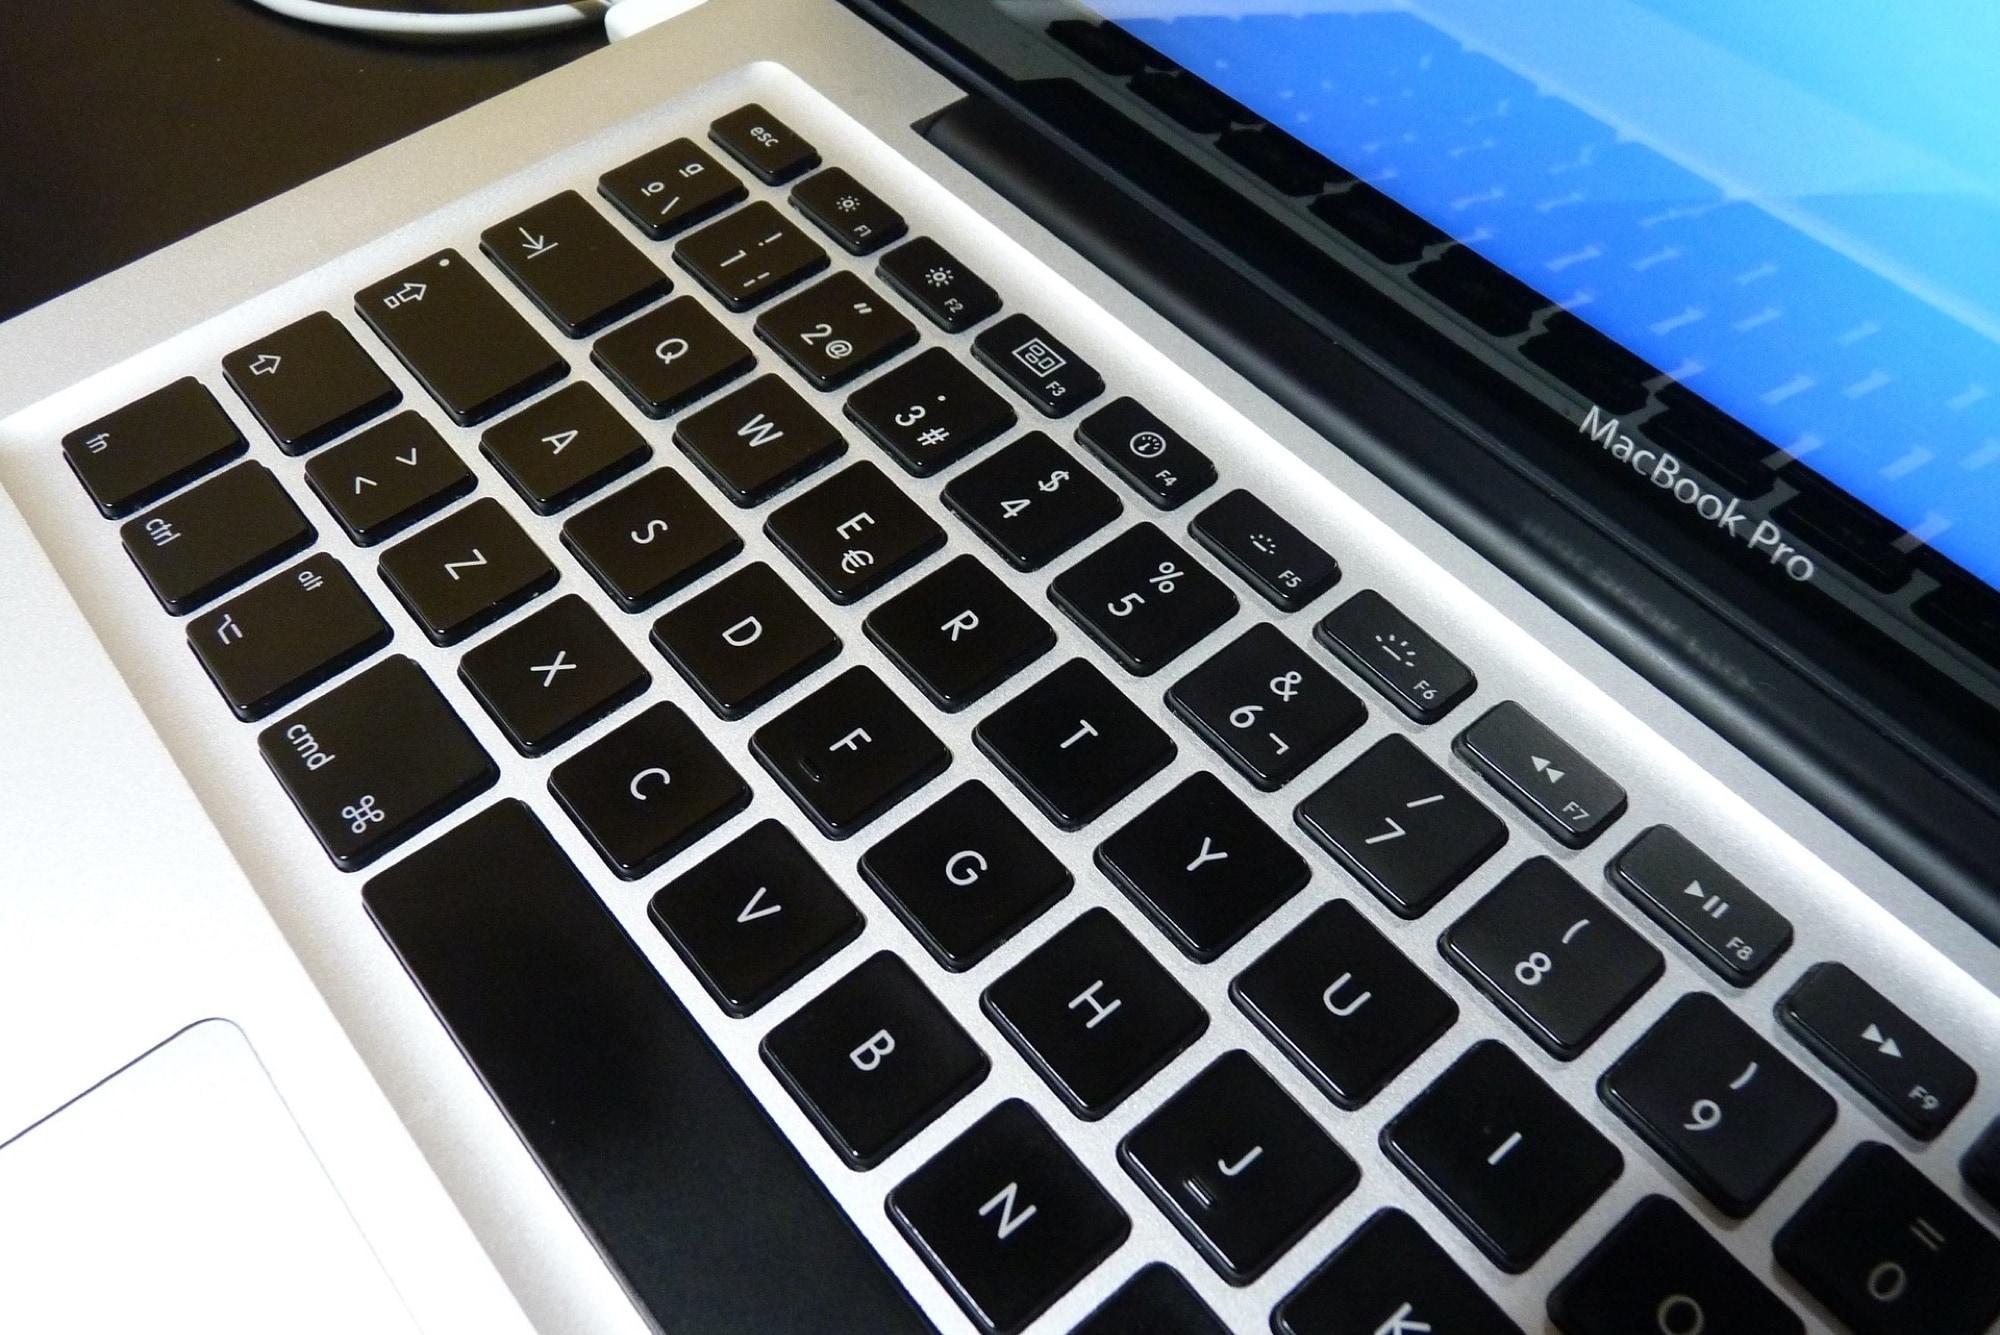 MacBook Pro keyboard -Pages keyboard shortcuts